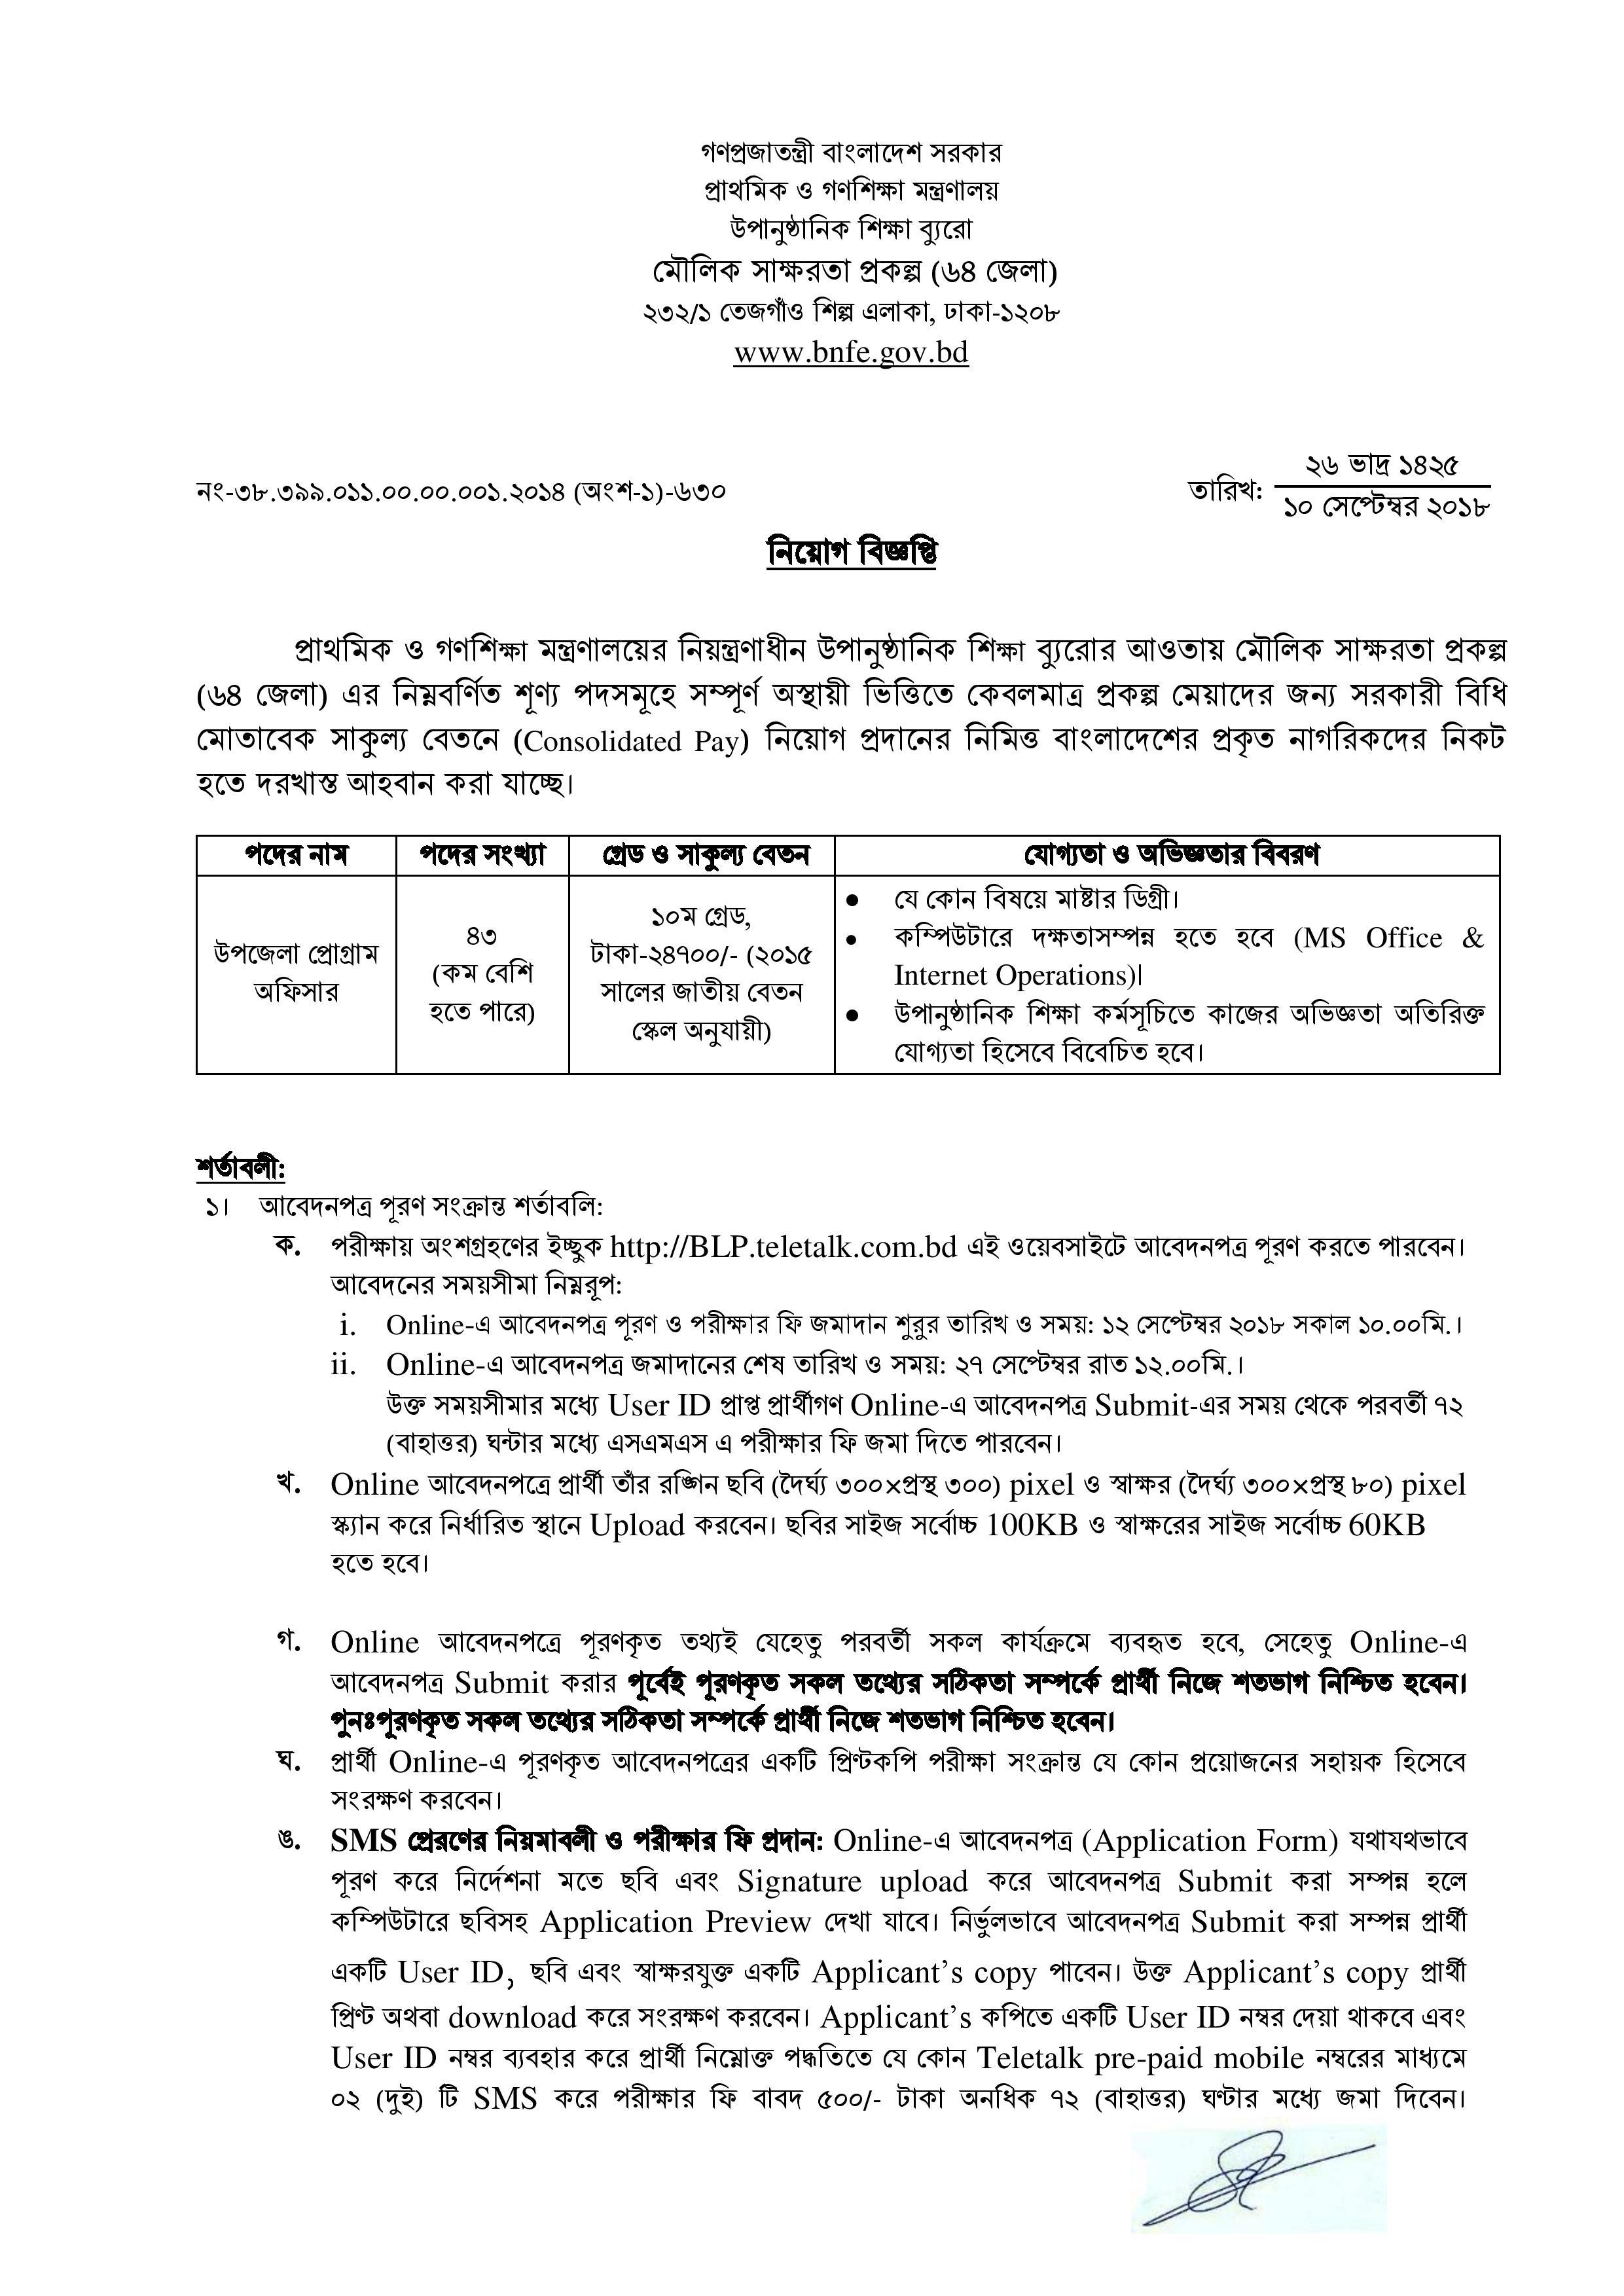 Primary and Mass Education Ministry Job Circular 2018, Prathomik o Gonosikkha Chakri, BLP Recruitment, প্রাথমিক ও গণশিক্ষা মন্ত্রণালয় নিয়োগ বিজ্ঞপ্তি ২০১৮